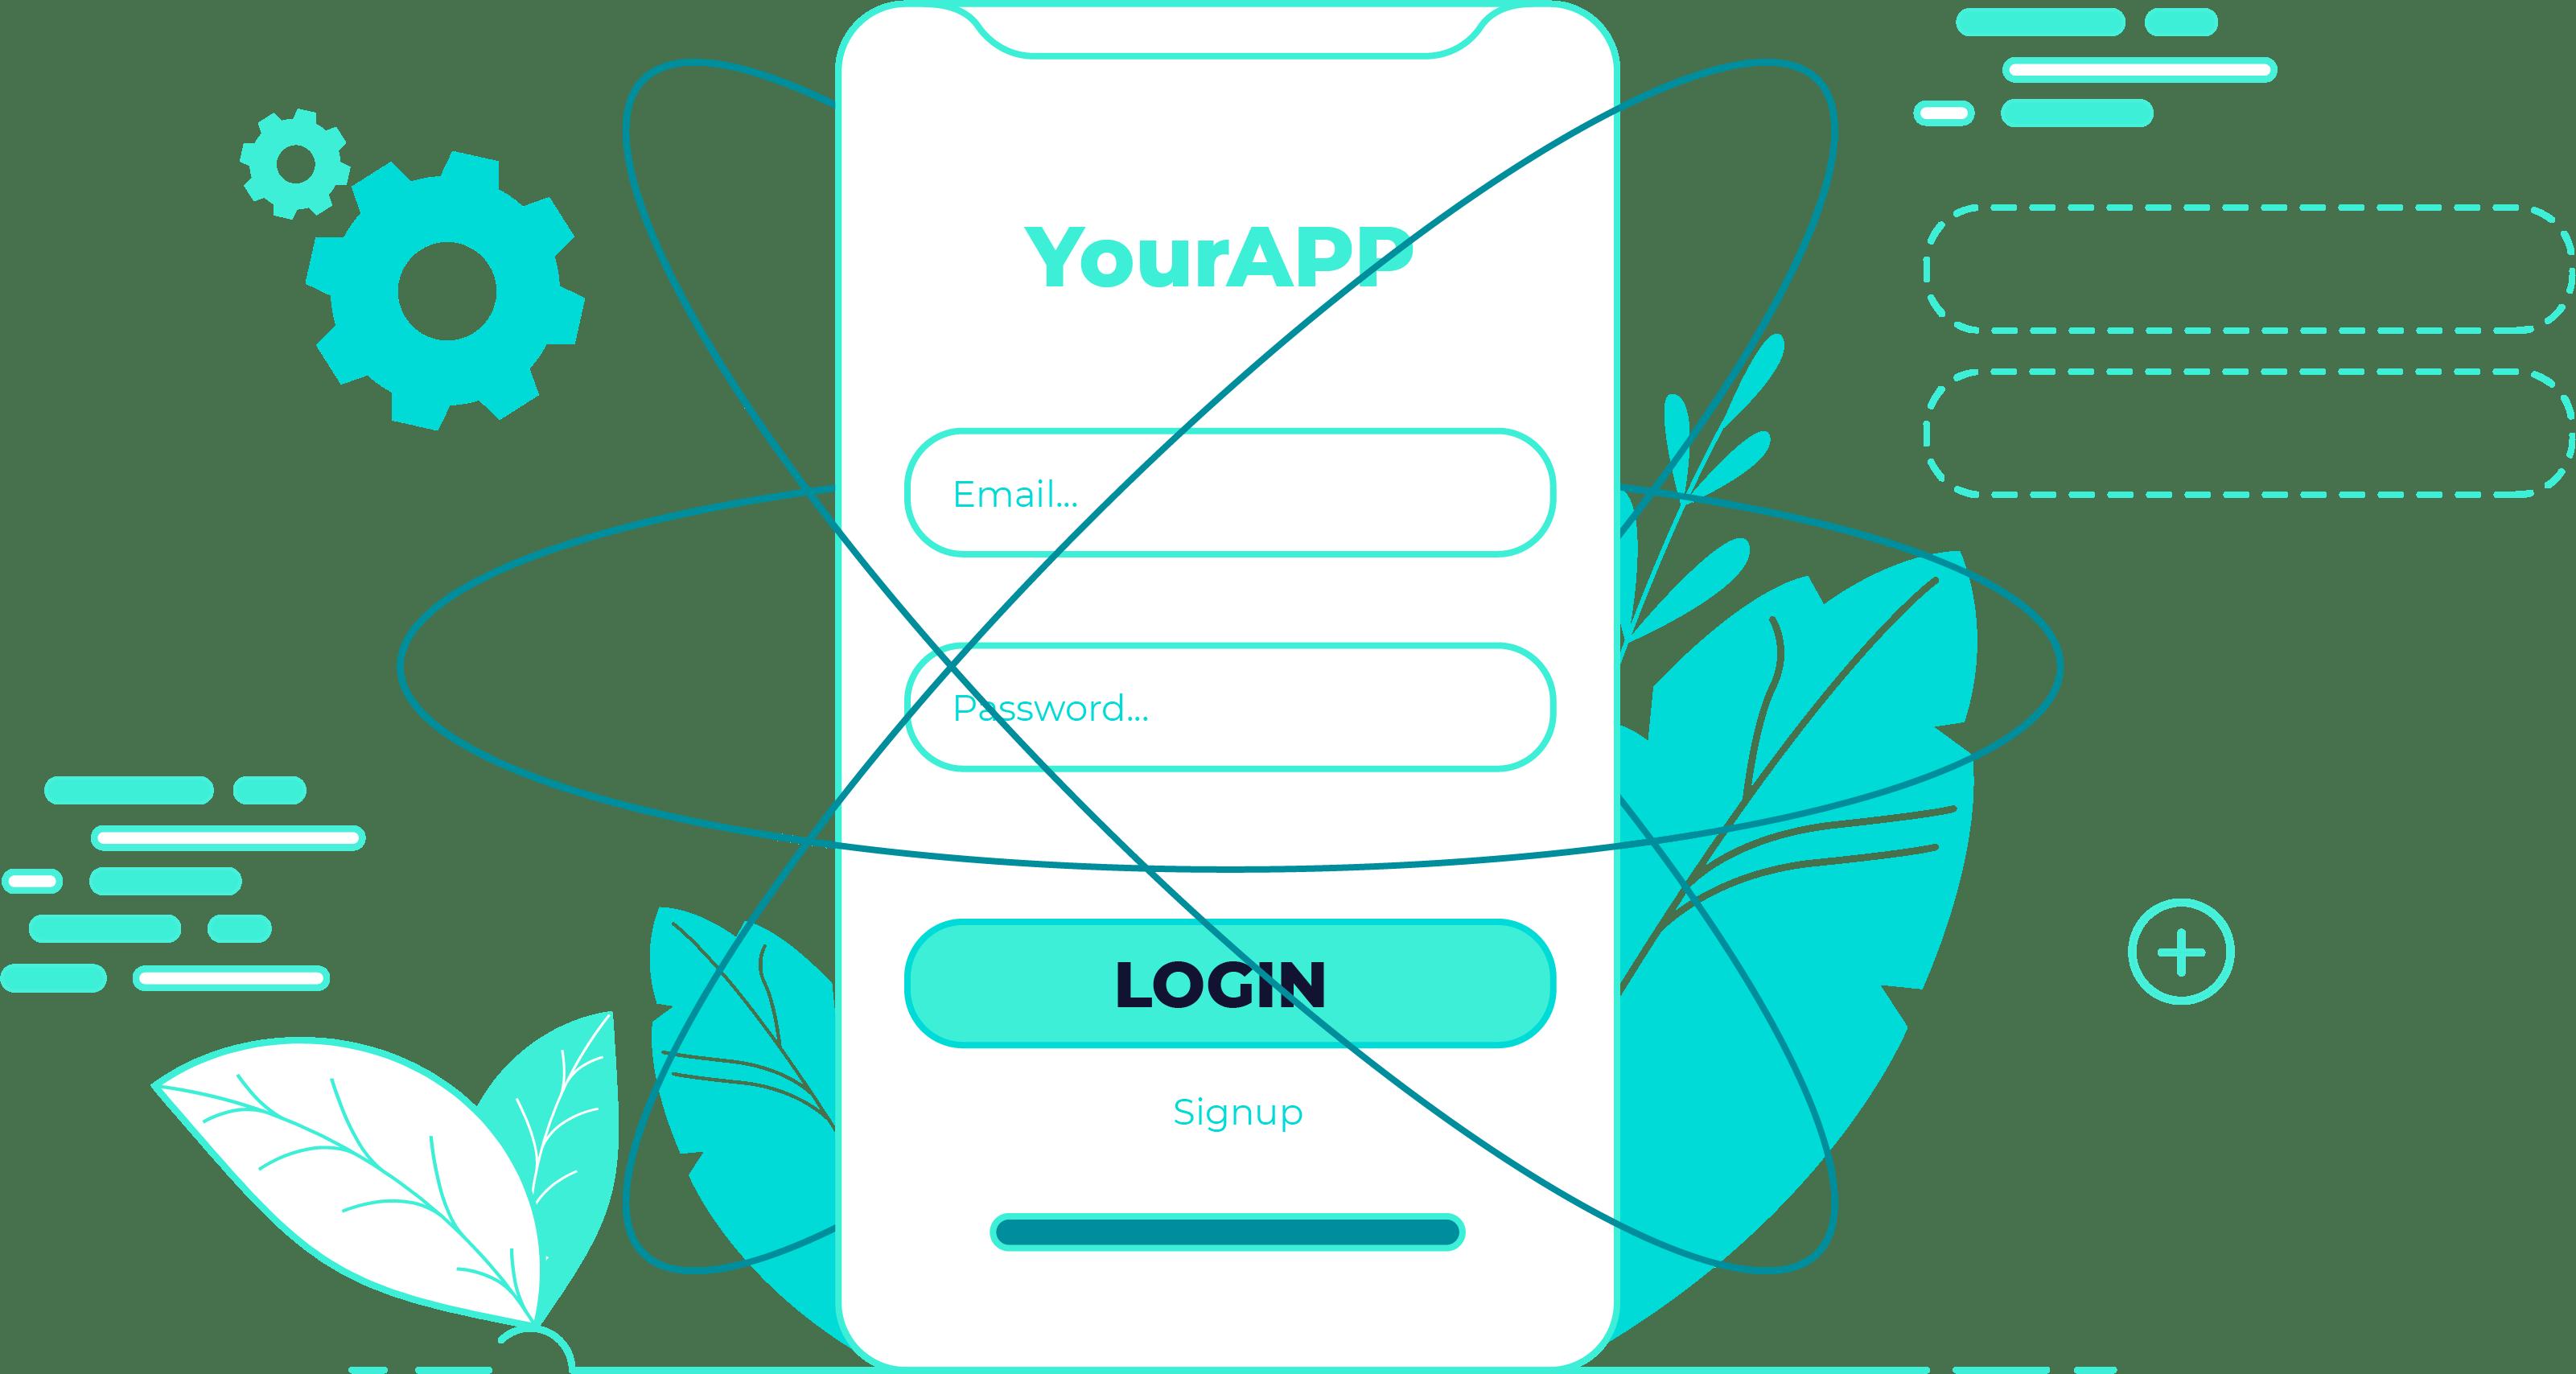 illustration of a login screen